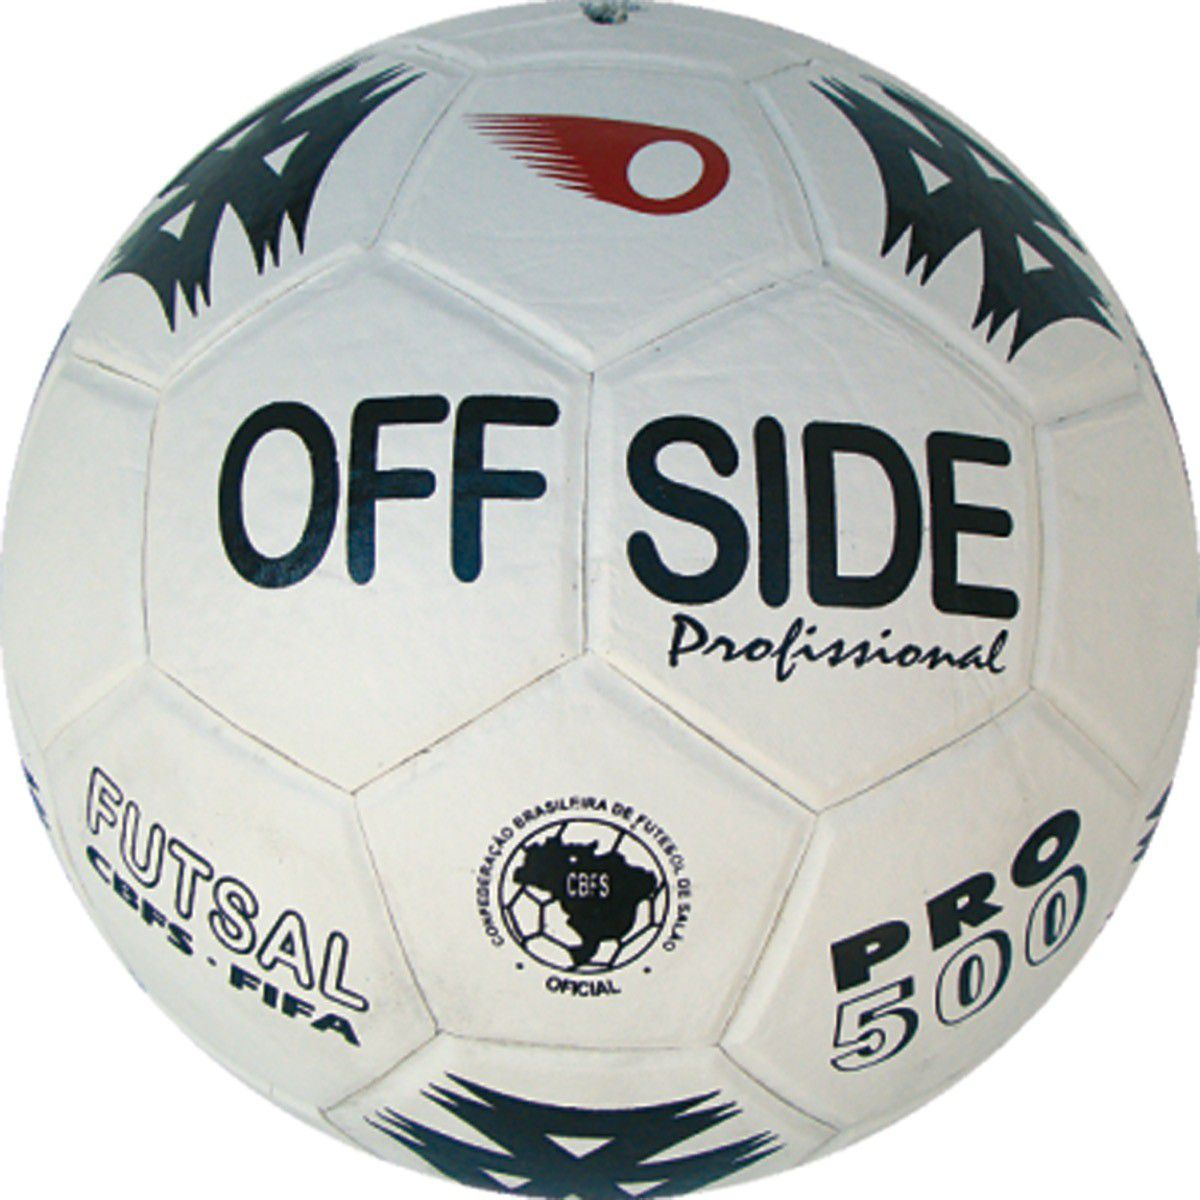 Bola Futsal Oficial Offside